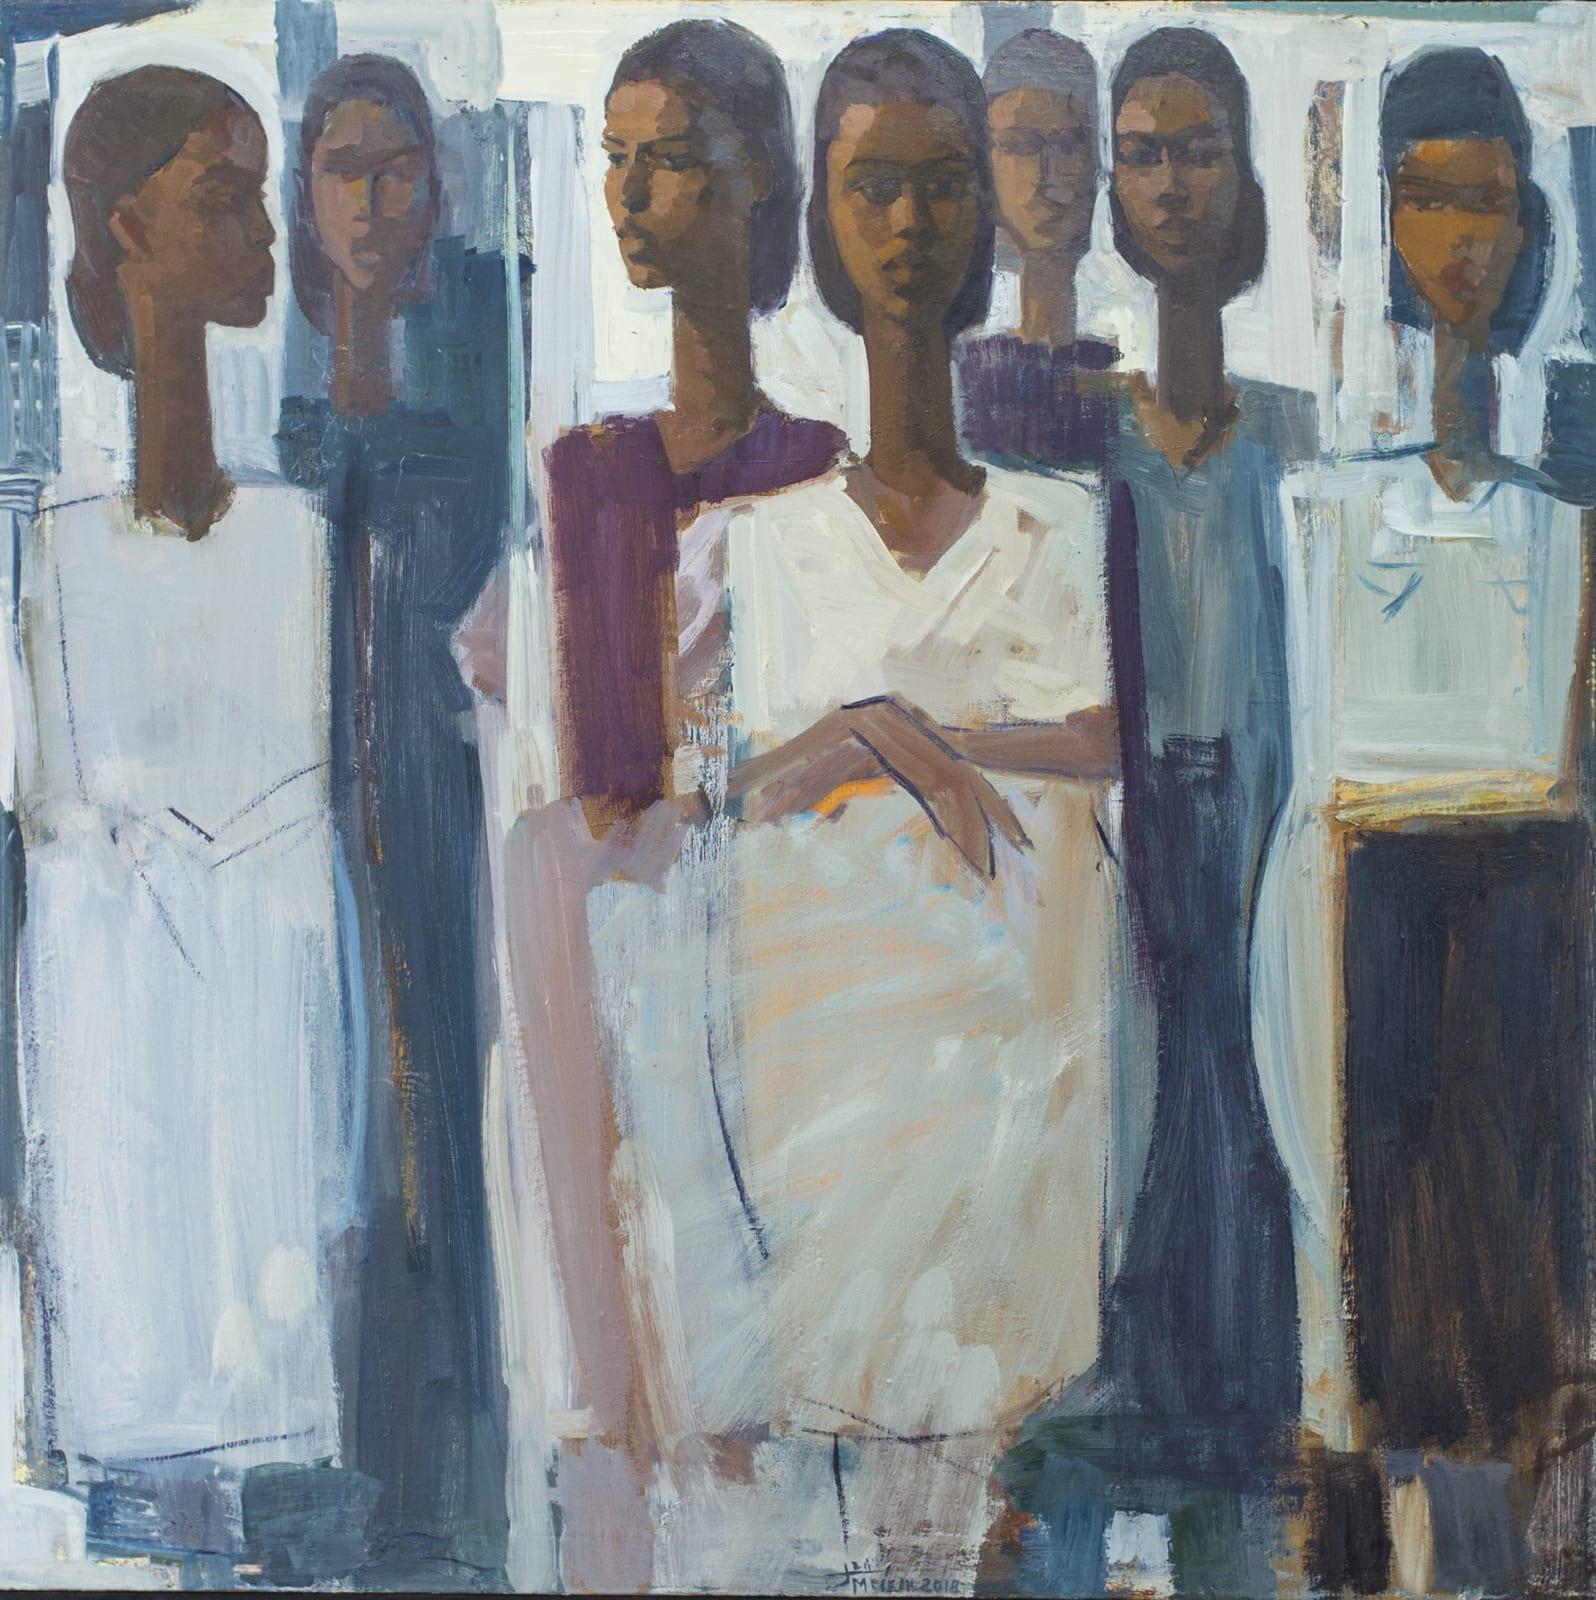 Tadesse Mesfin, Pillars of Life: Expectations, 2018